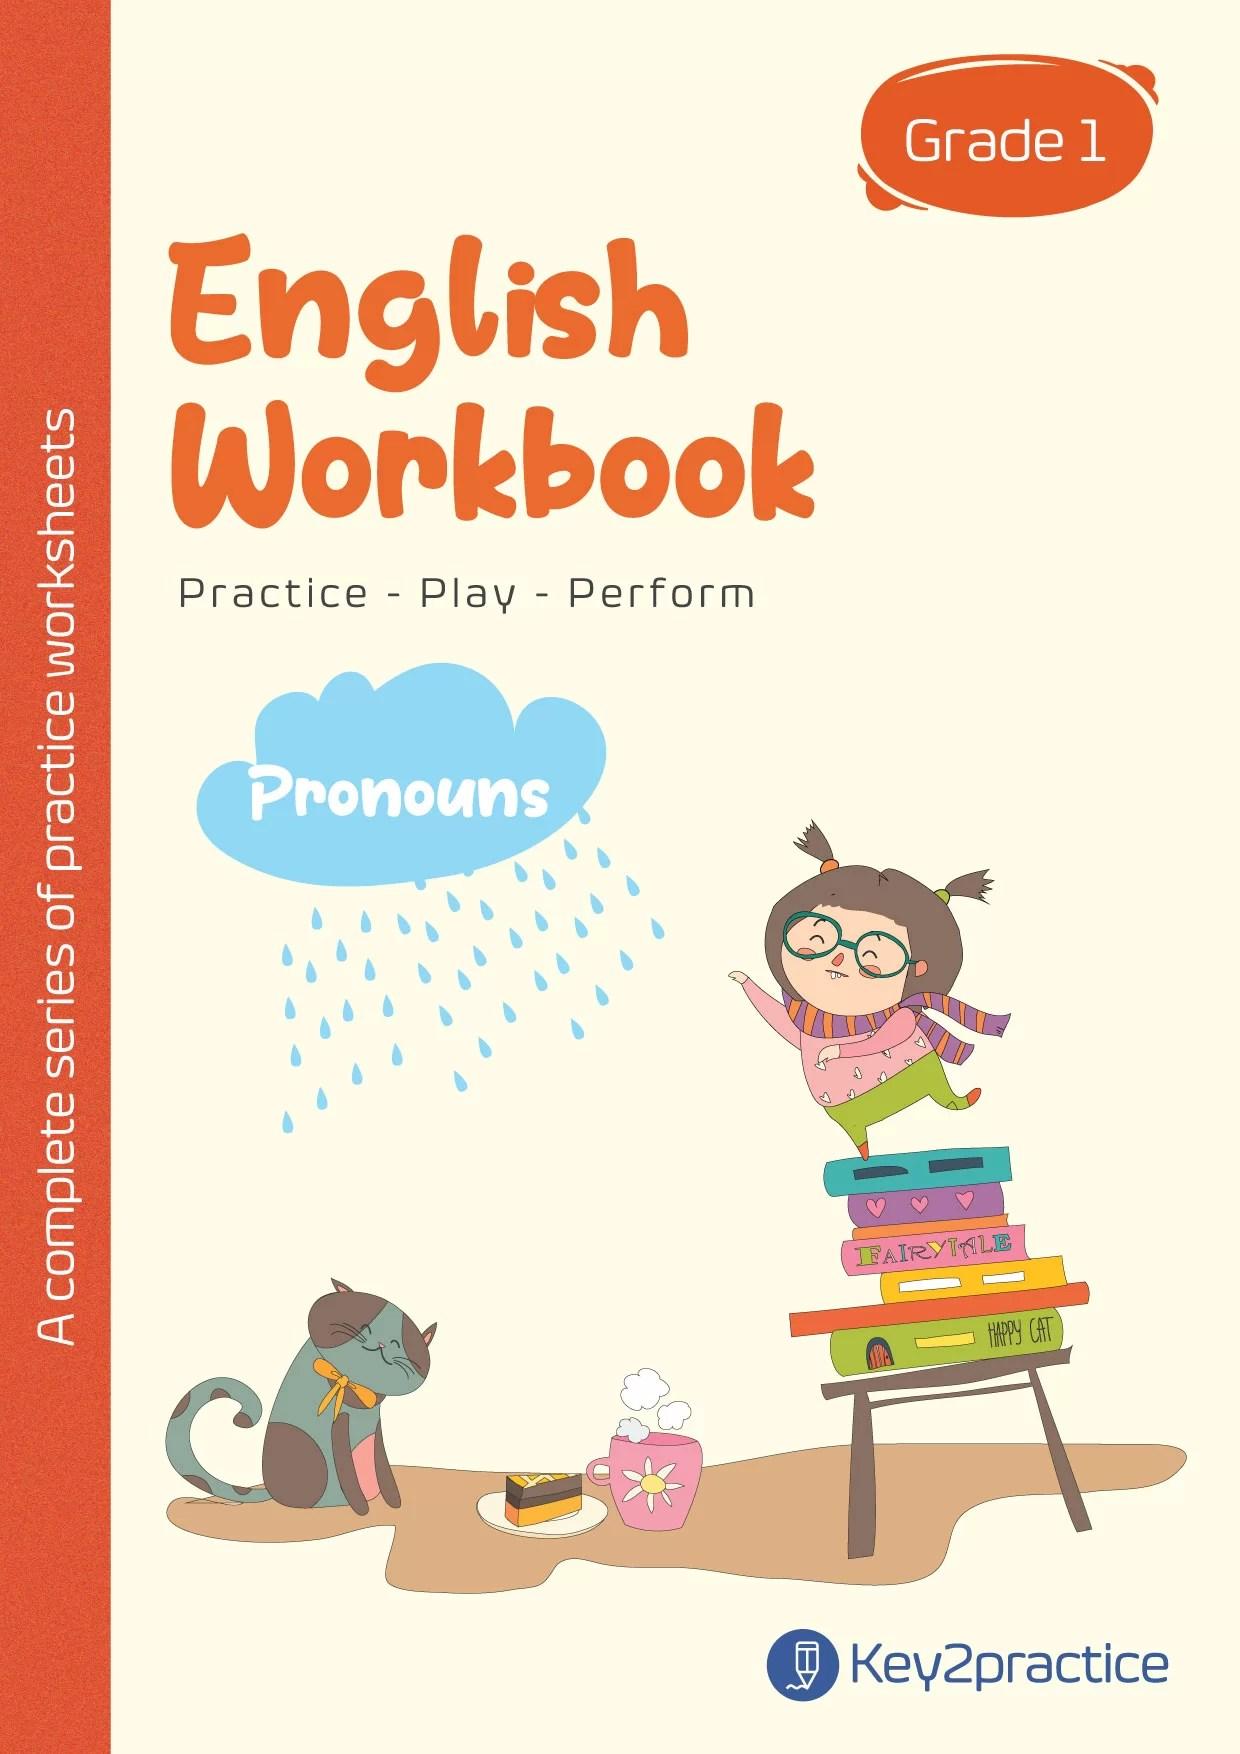 English Worksheets Grade 1 Chapter Pronouns